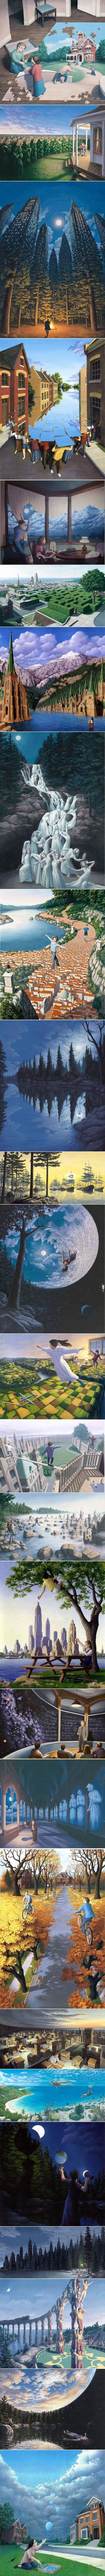 Surrealizm na obrazach